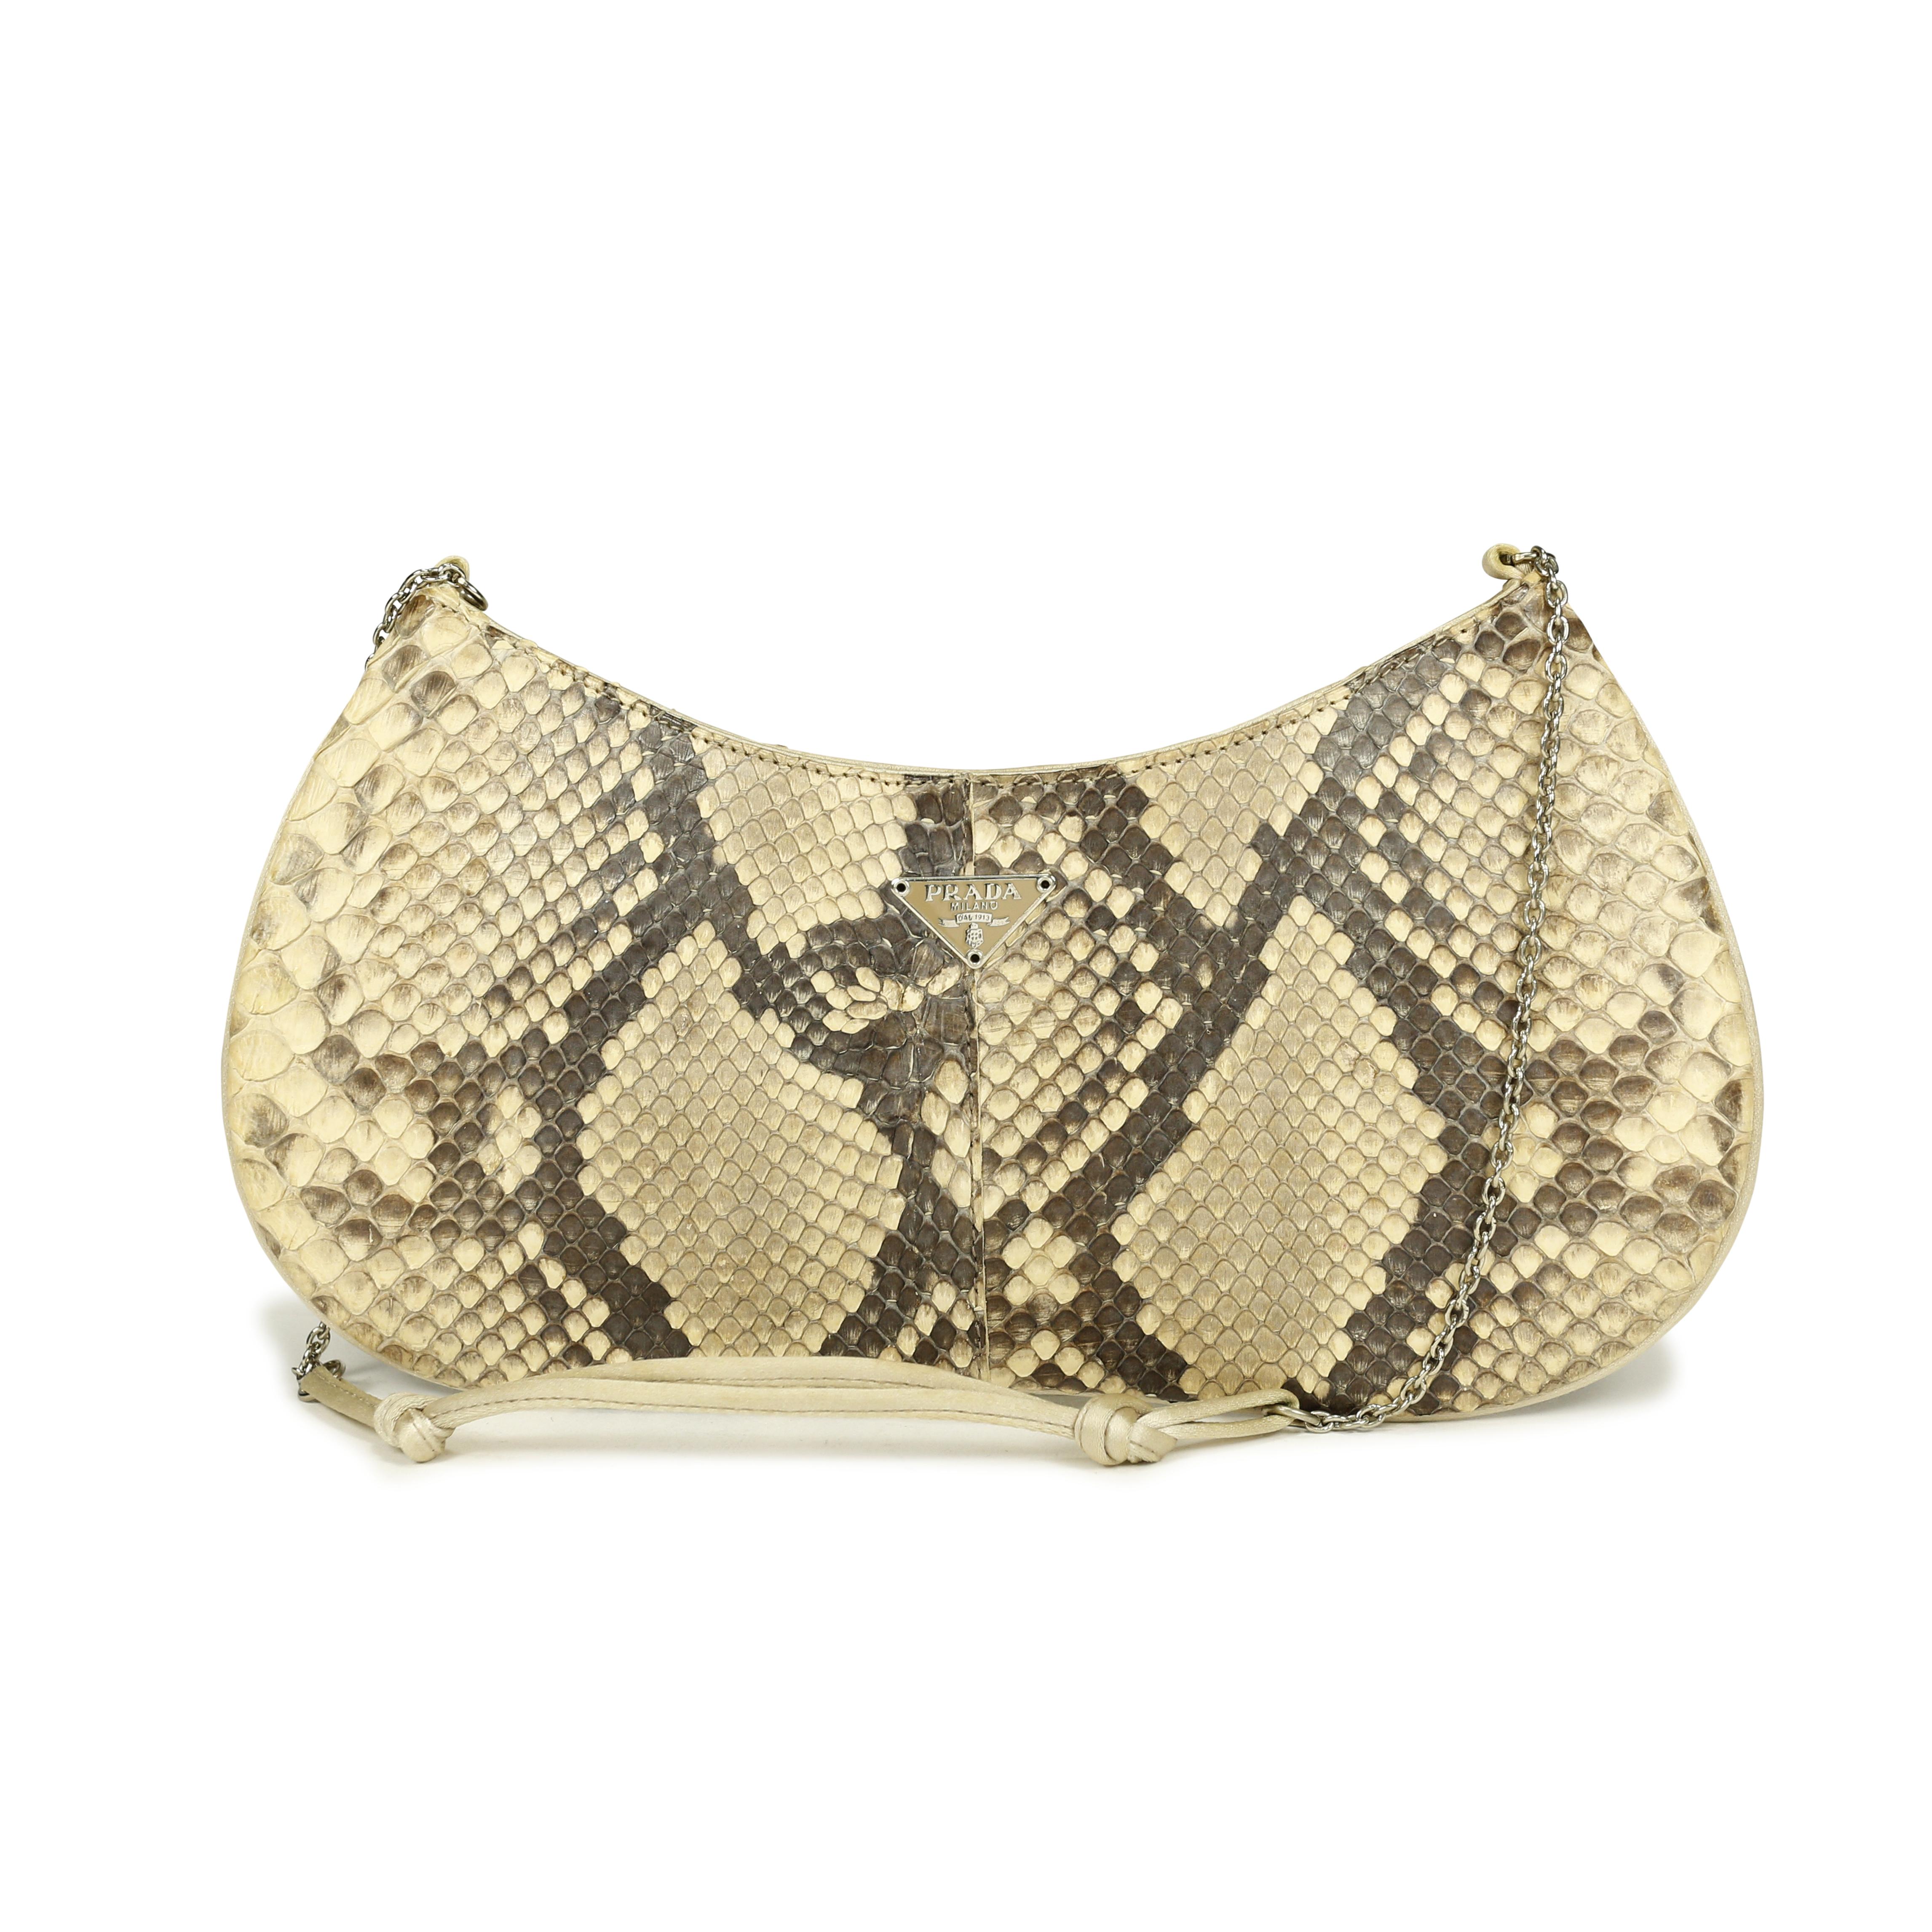 second hand prada snakeskin handbag the fifth collection. Black Bedroom Furniture Sets. Home Design Ideas